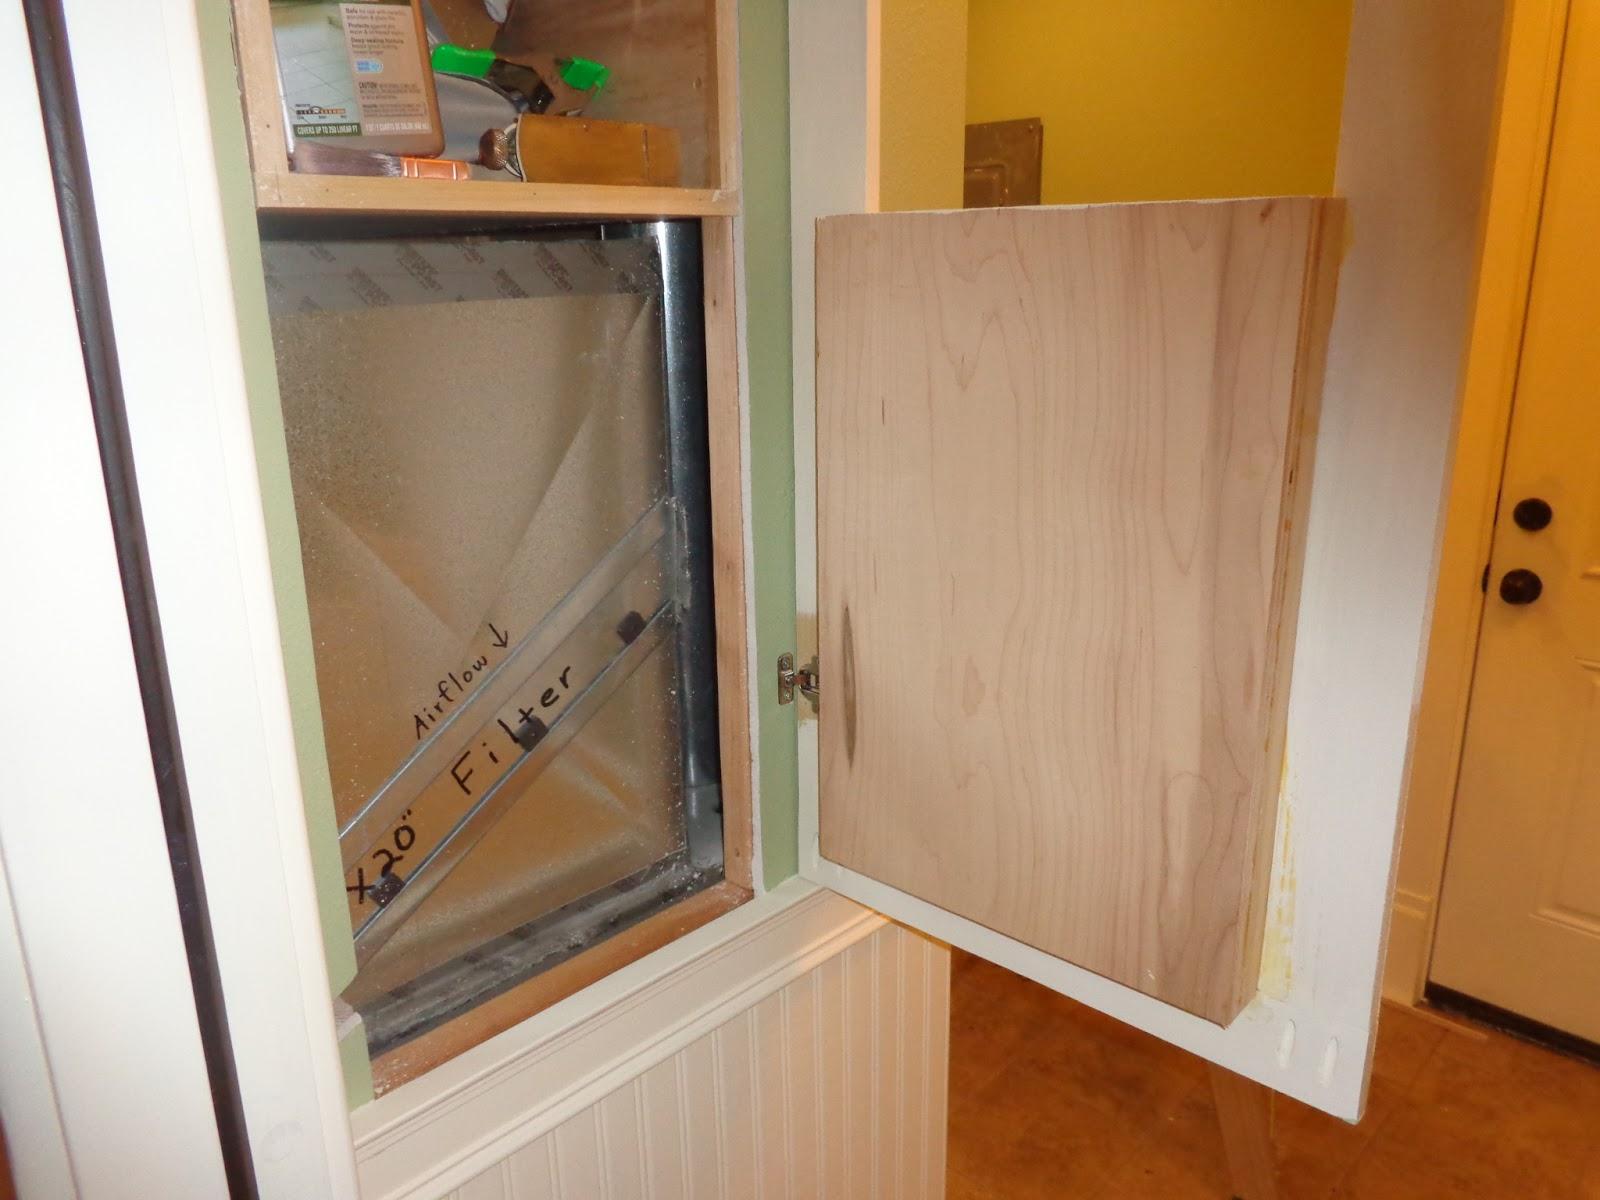 The Smiths Laundry Room Cabinet Door